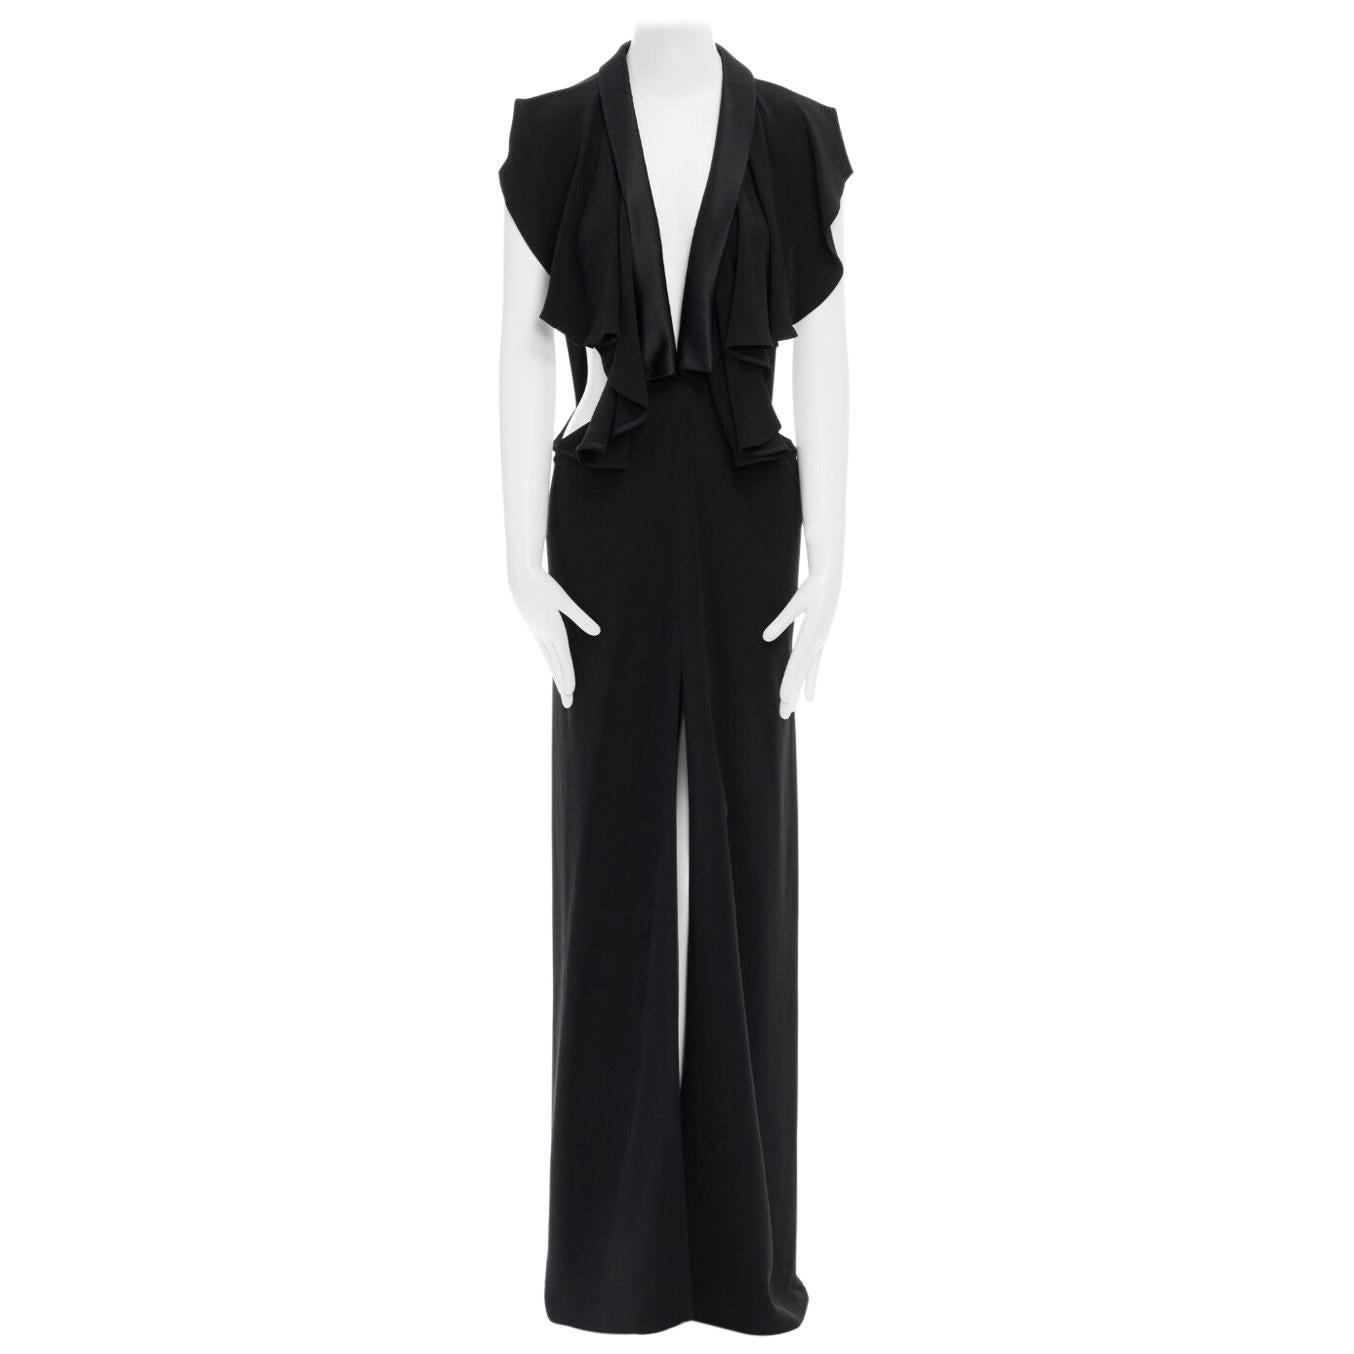 runway YVES SAINT LAURENT PILATI black tuxedo ruffle cut out dress gown FR36